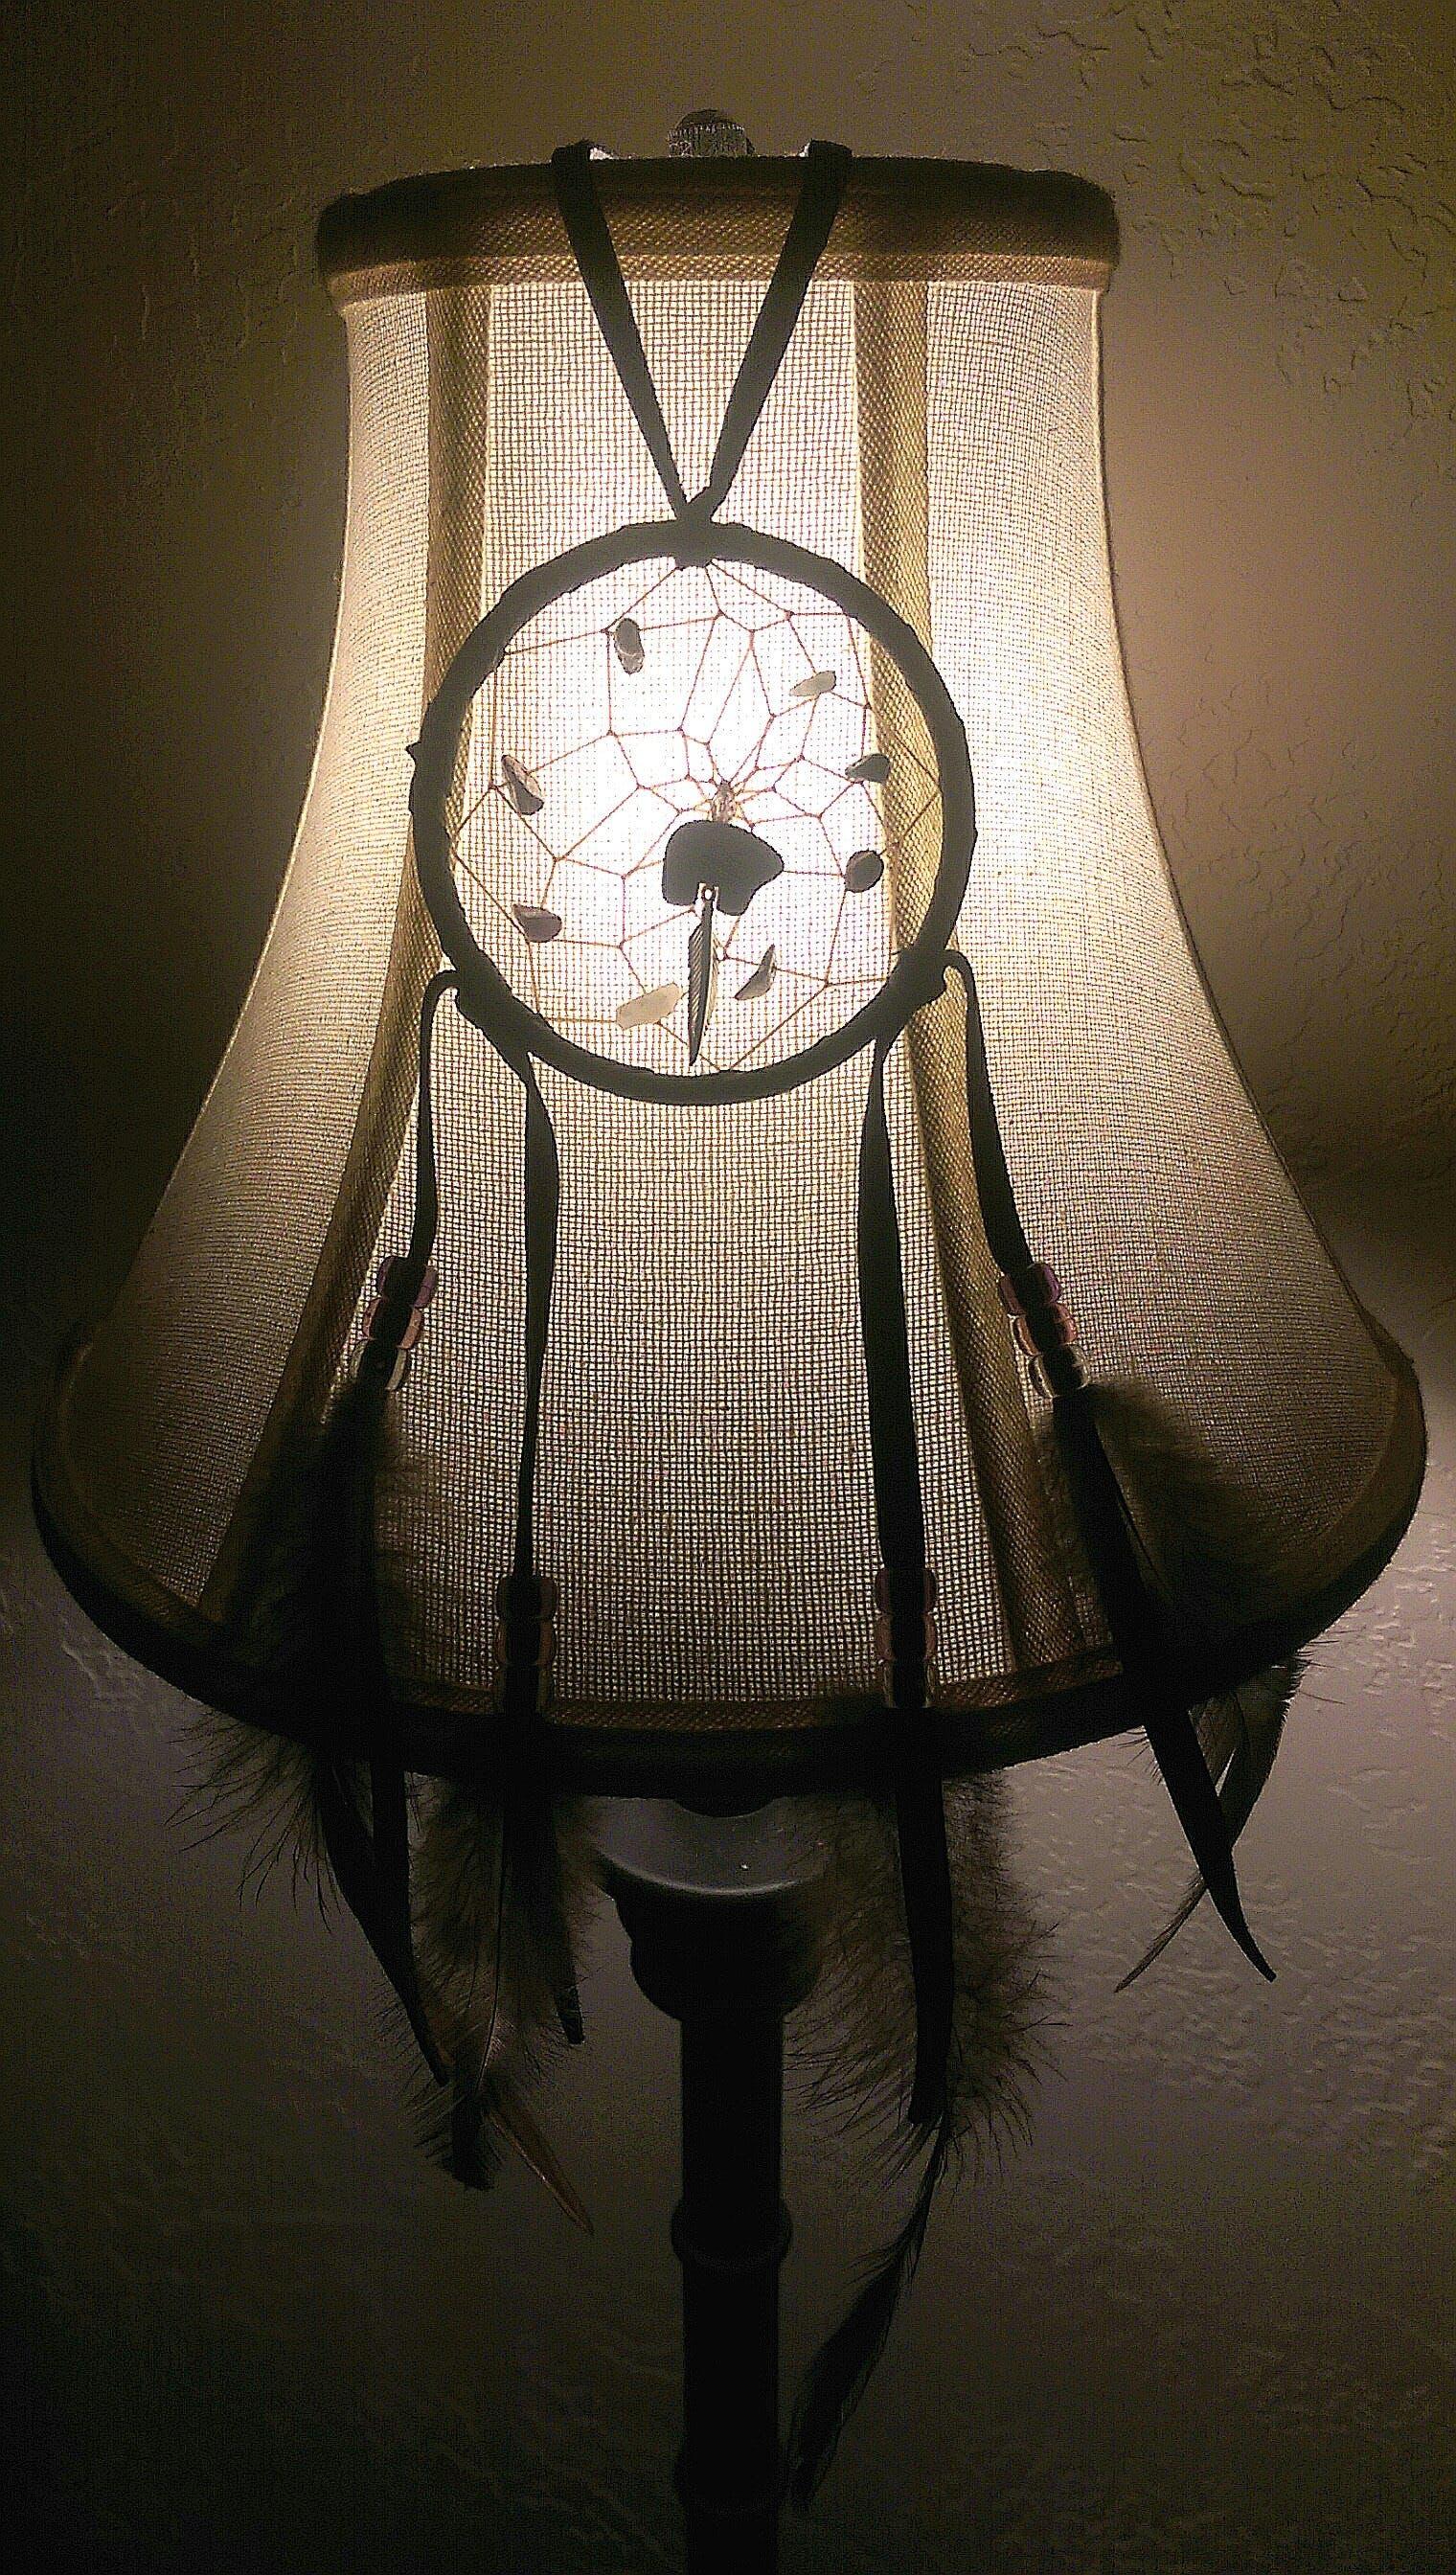 Free stock photo of lamp, design, living room, dream catcher